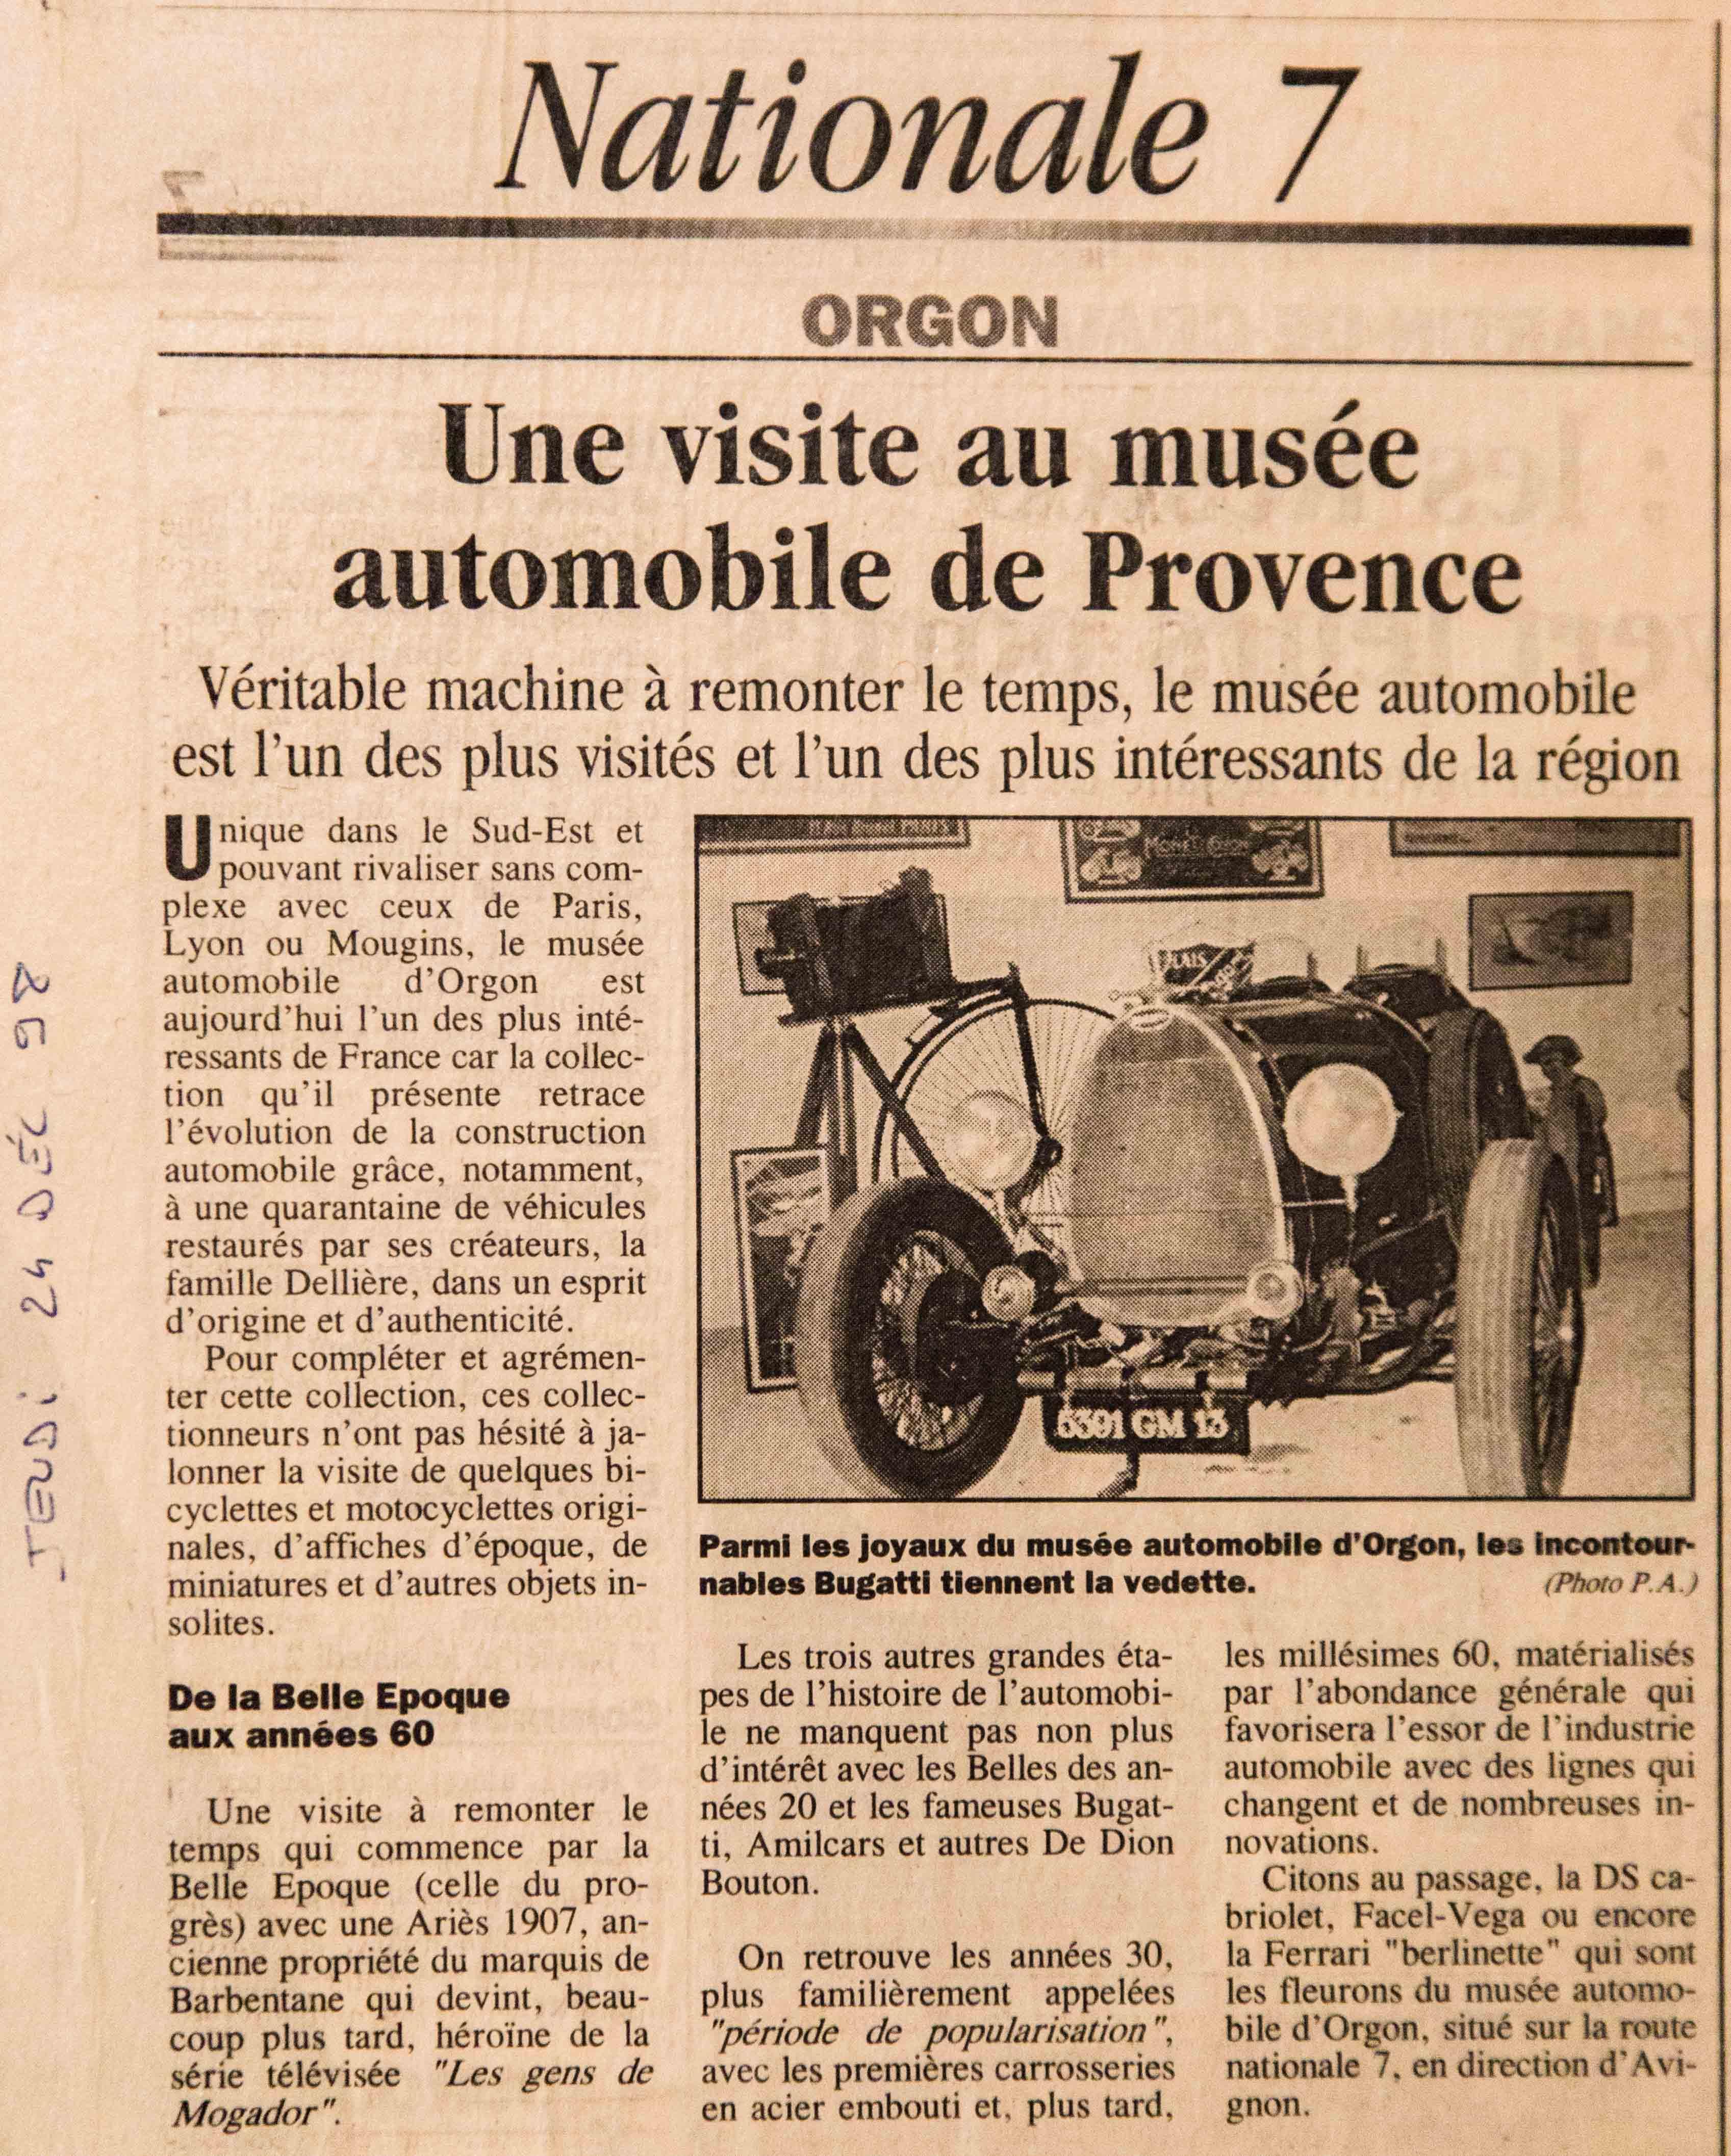 1998 - Musée Automobile de Provence